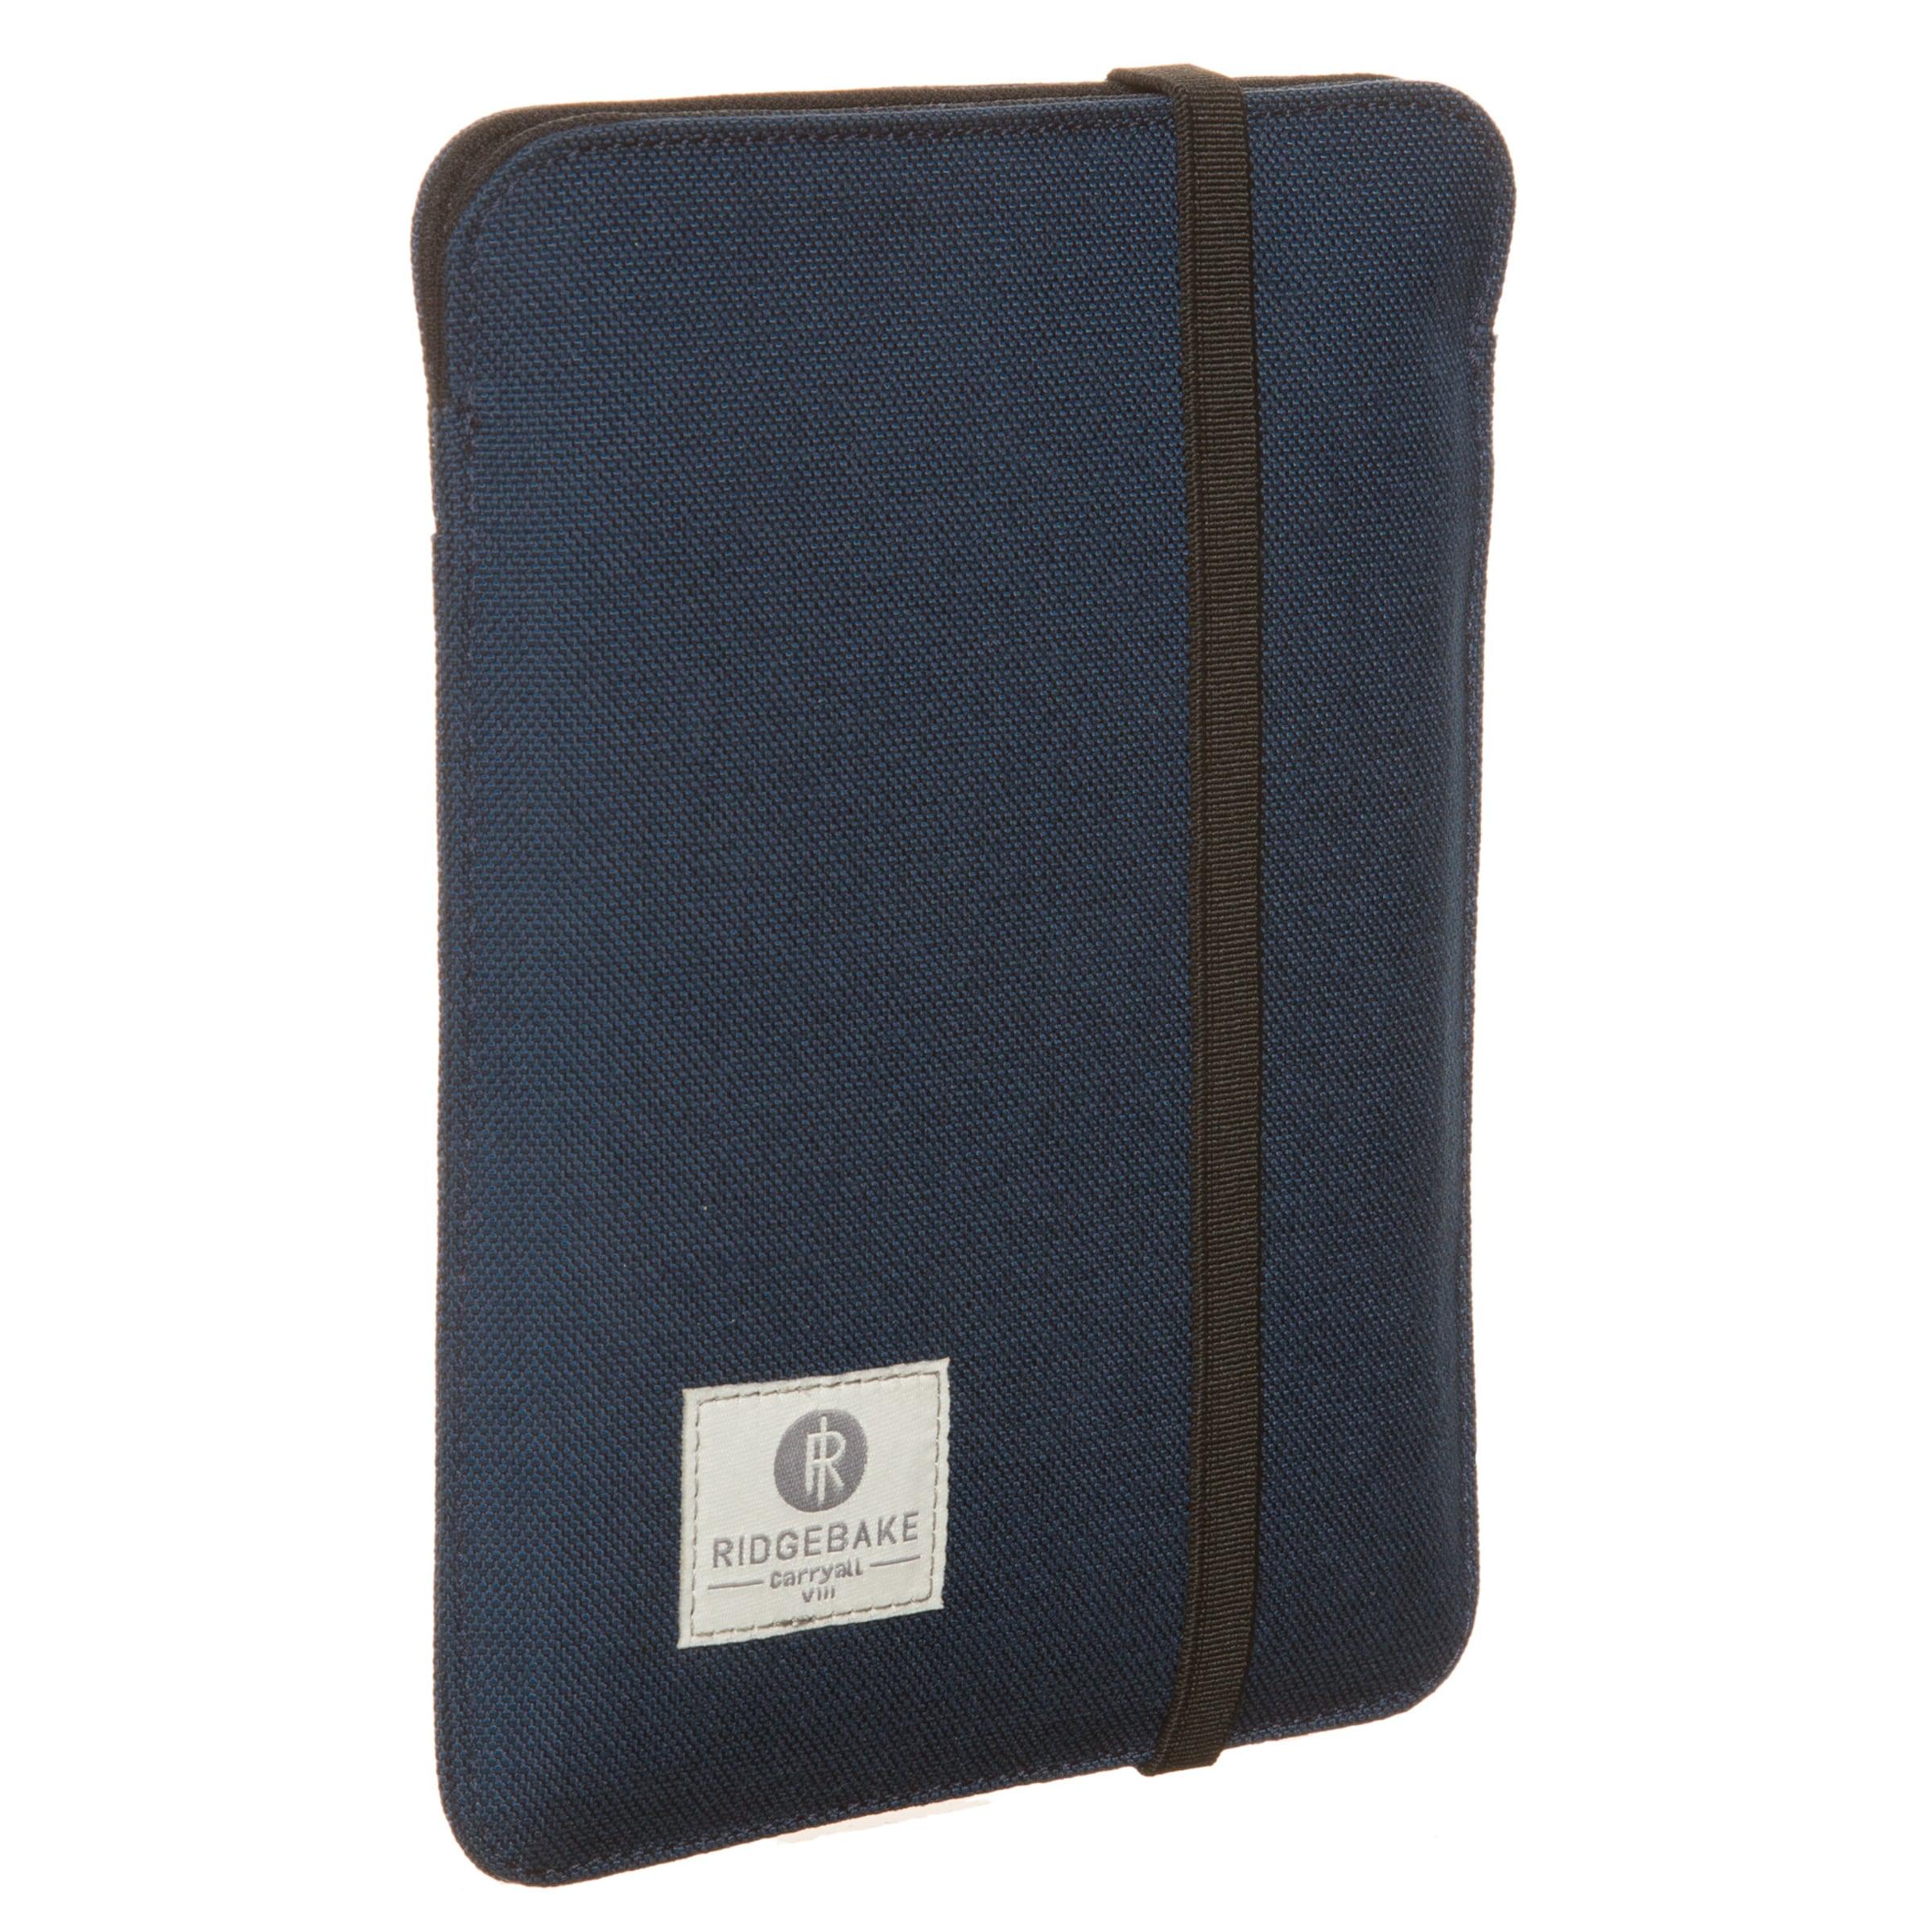 Ridgebake In Tasche Blau Ipad Mini b6Ivmf7gYy